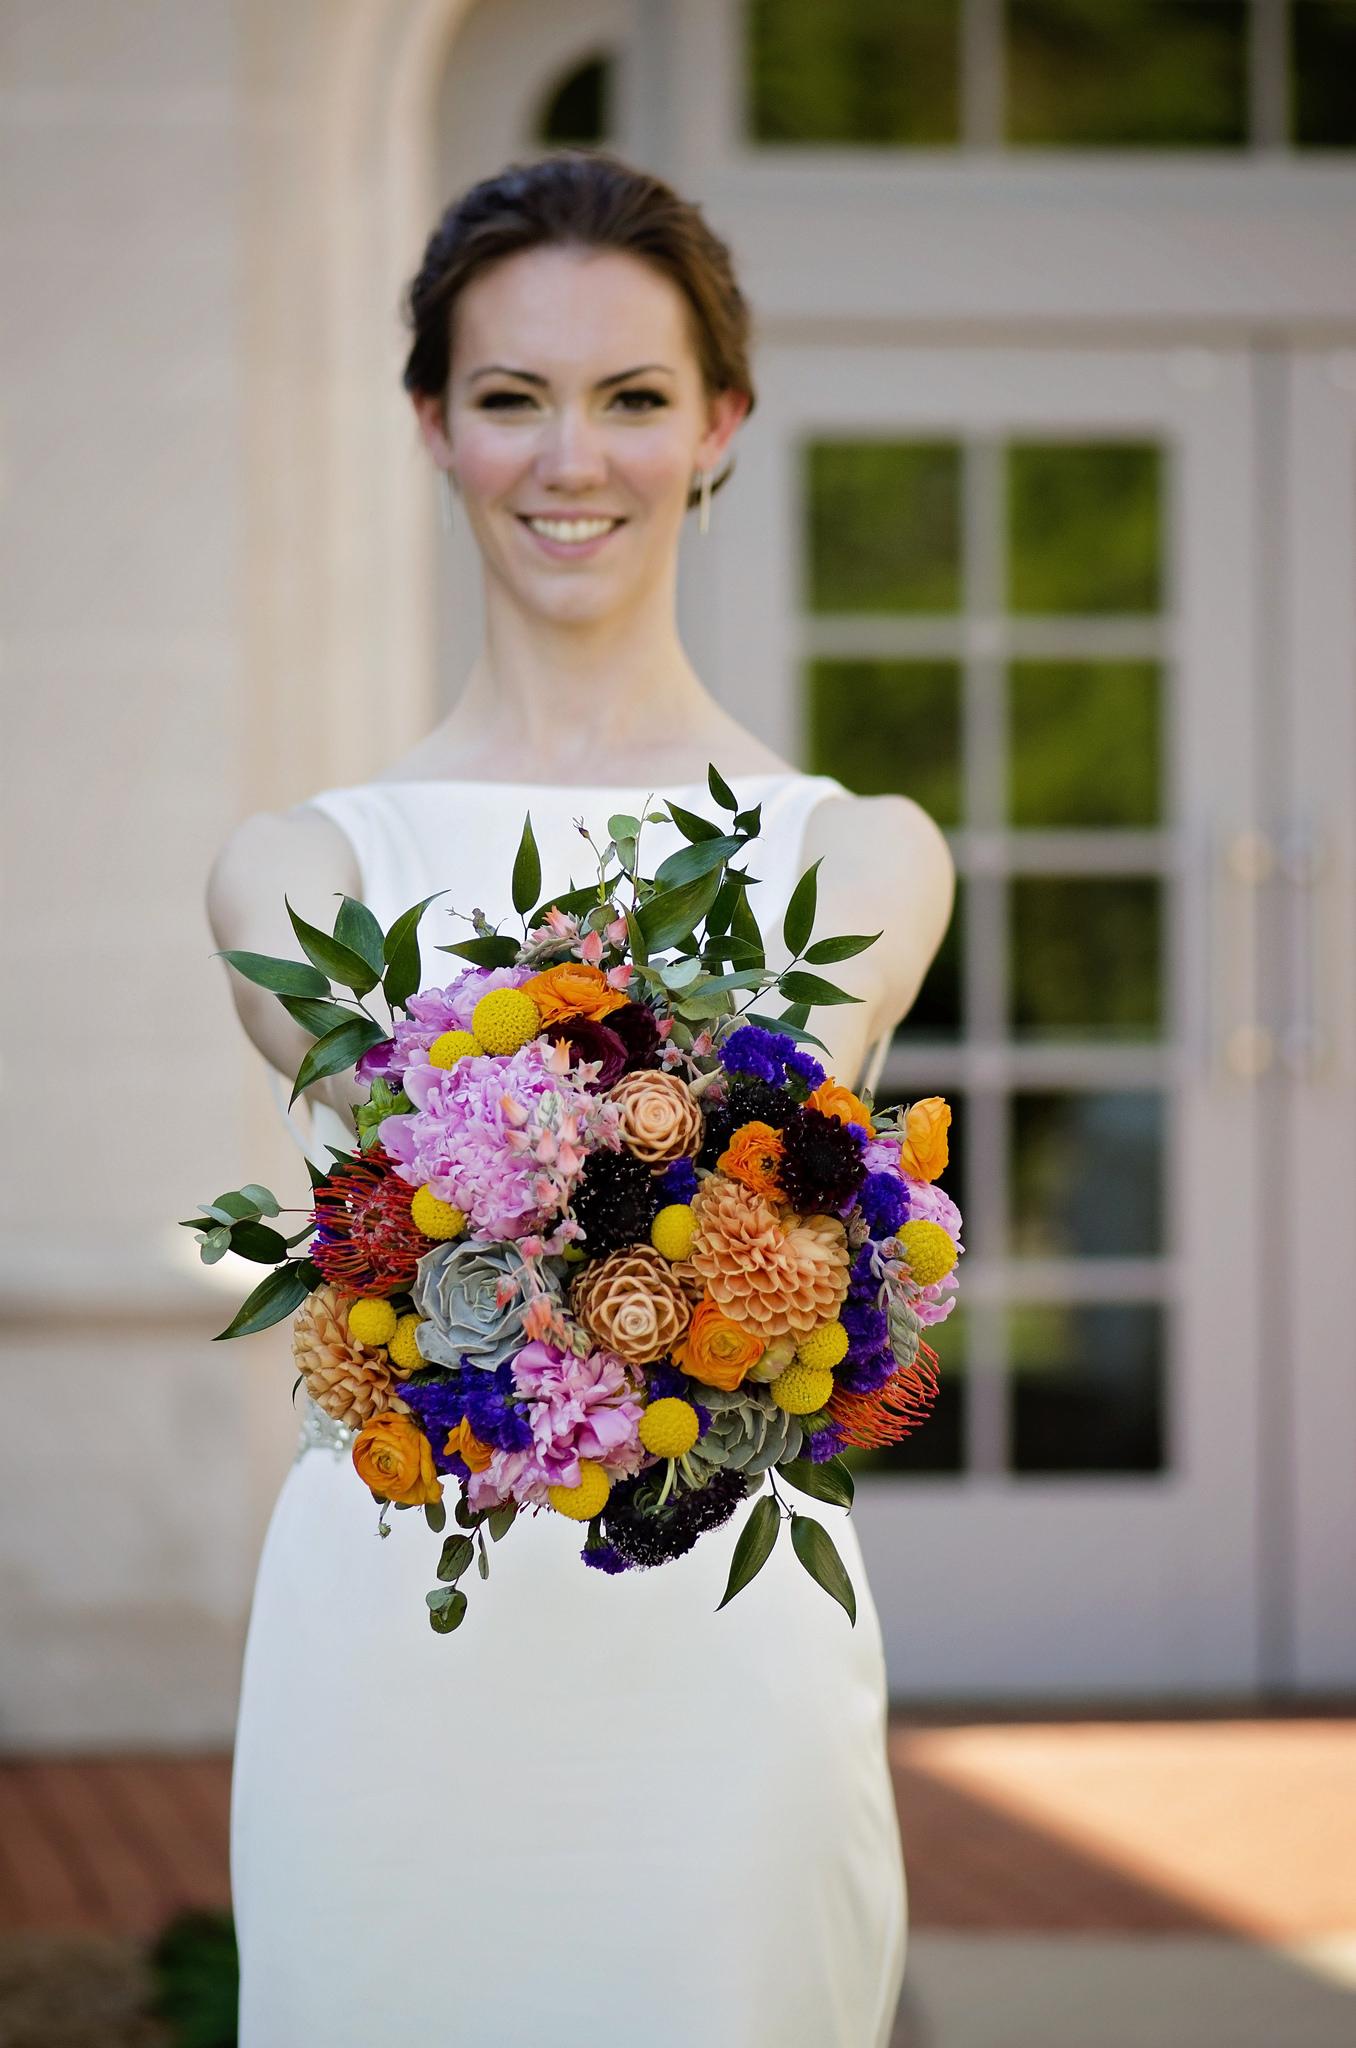 cindi_wedding_flowers_spiritedtable_photo11.jpg